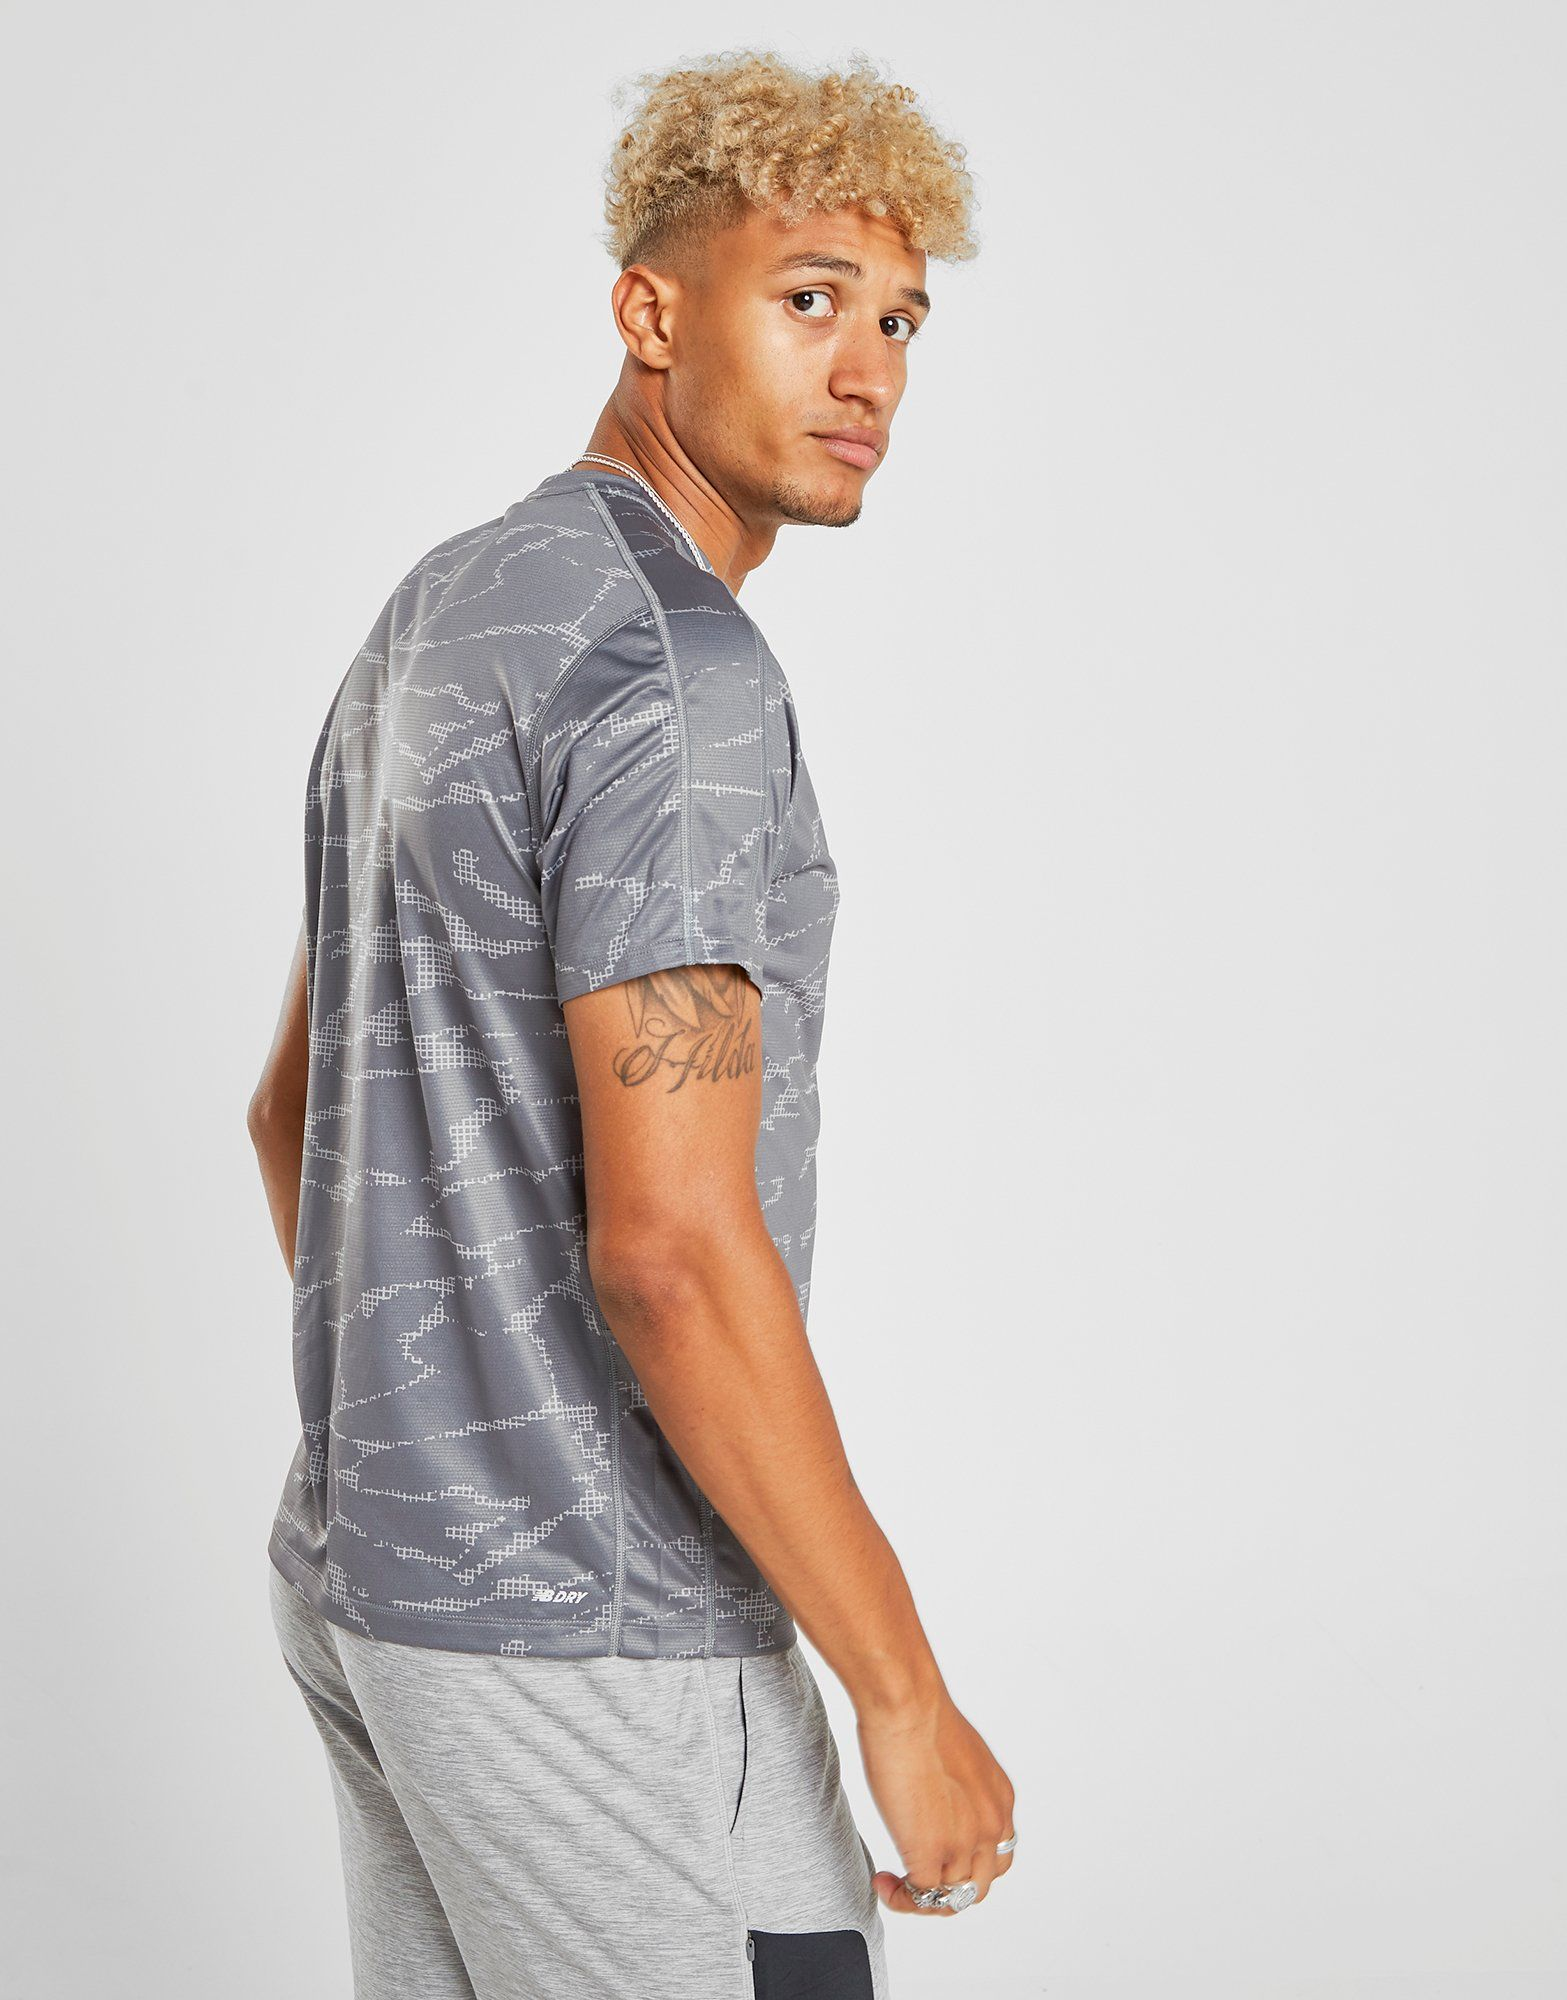 New Balance camiseta Accelerate All Over Print